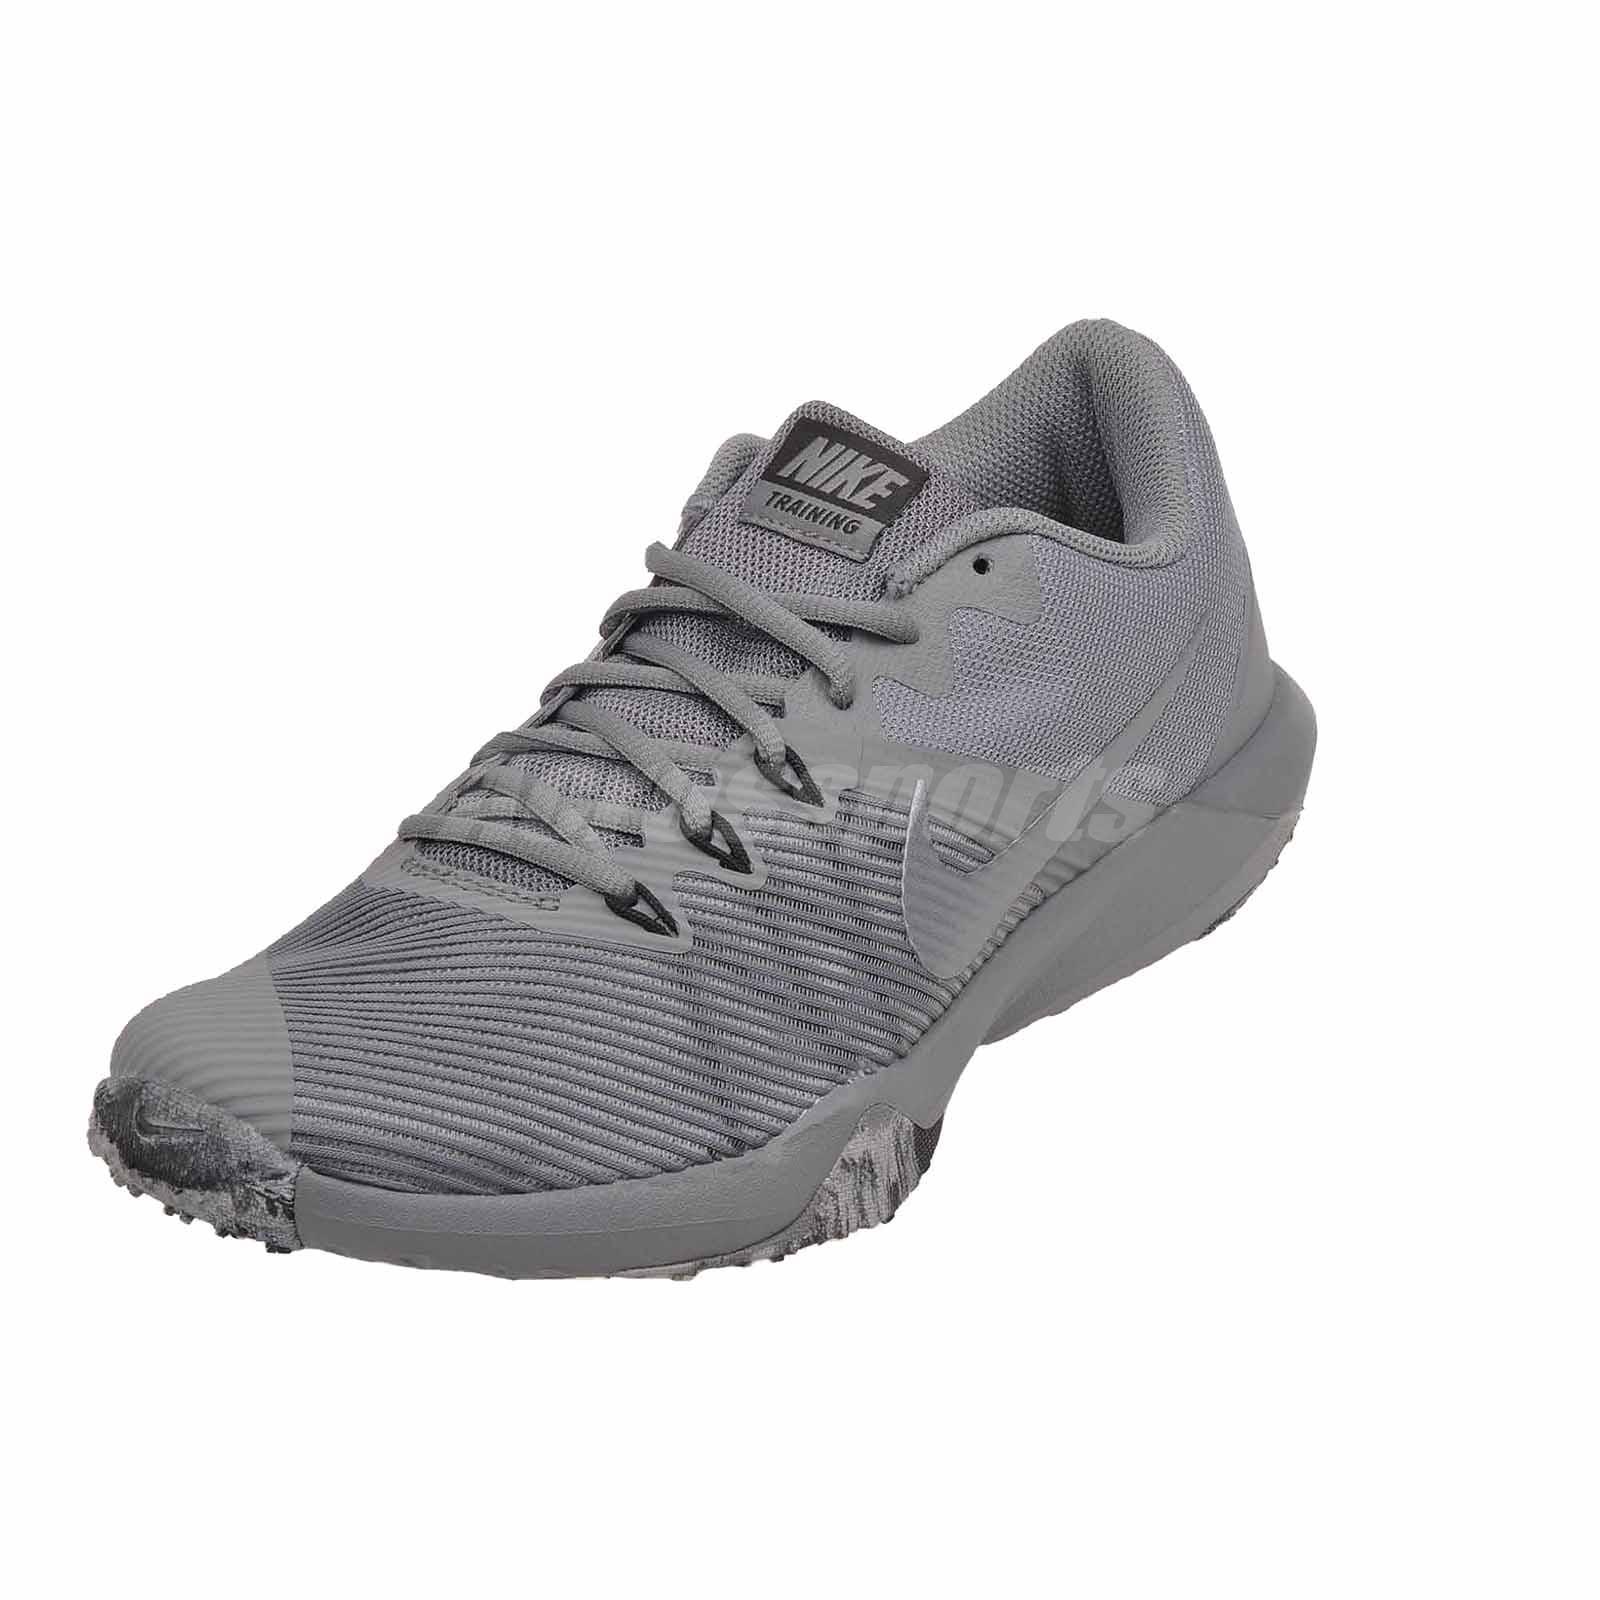 258c4d85628 Nike Retaliation TR Cross Training Mens Shoes Trainers Cool Grey ...